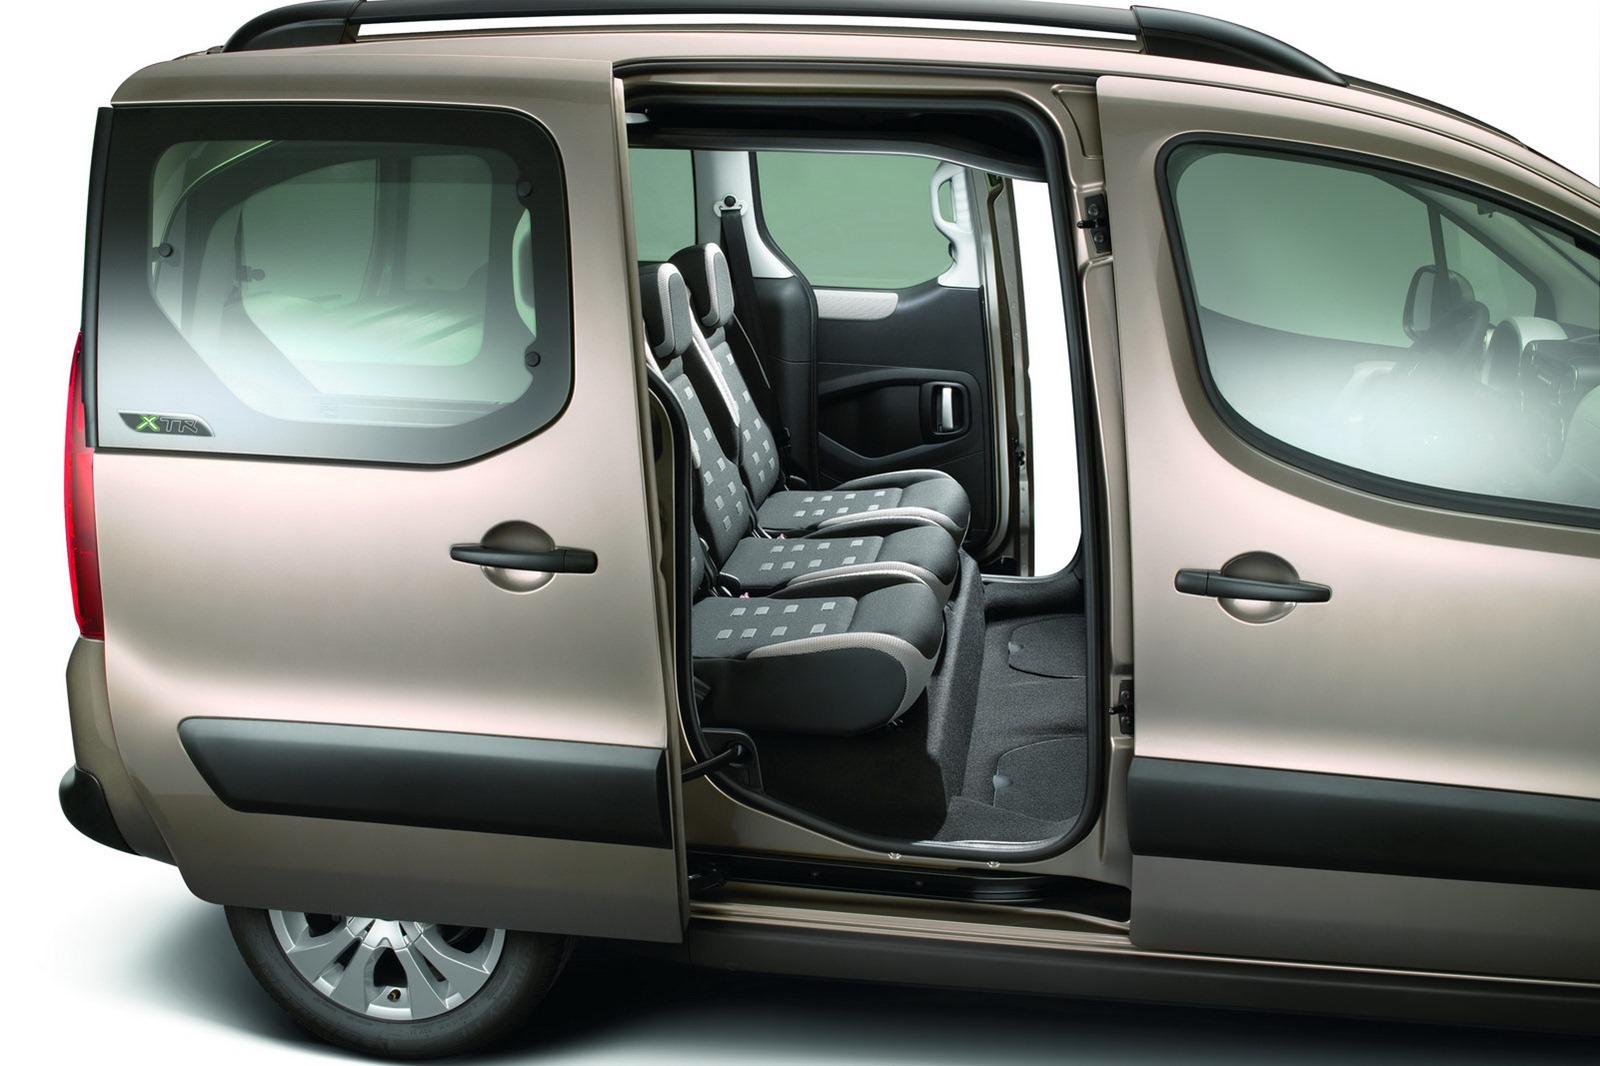 citroen berlingo and dispatch get 2012 facelift autoevolution. Black Bedroom Furniture Sets. Home Design Ideas